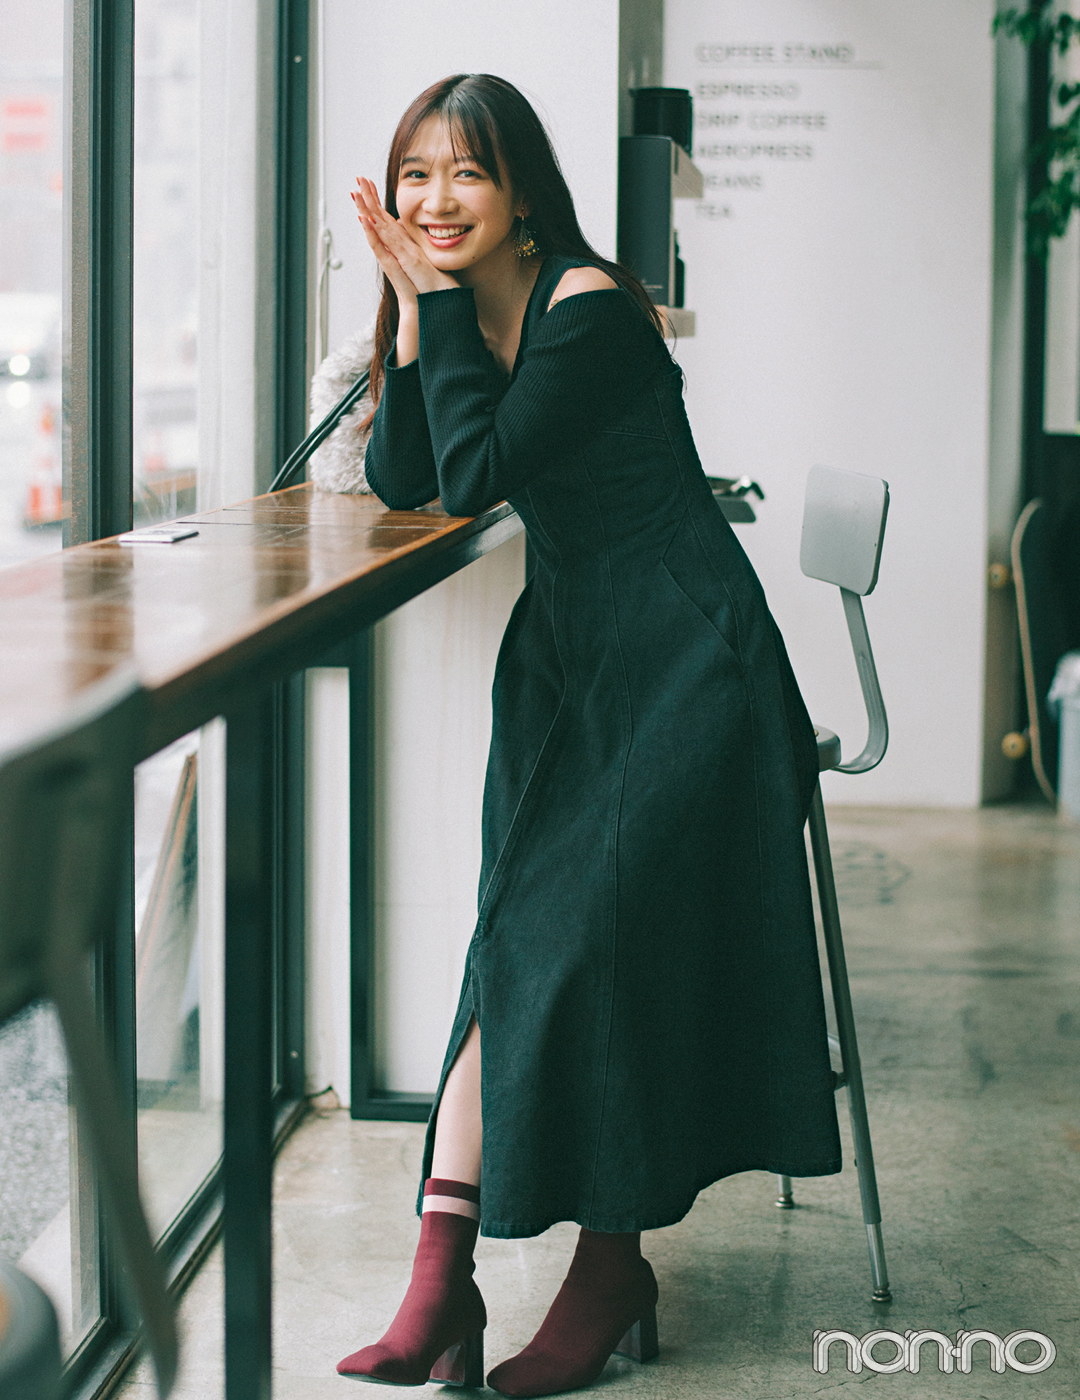 Photo Gallery|ナチュラルな可愛さにきゅん♡ 岡本夏美フォトギャラリー_1_17